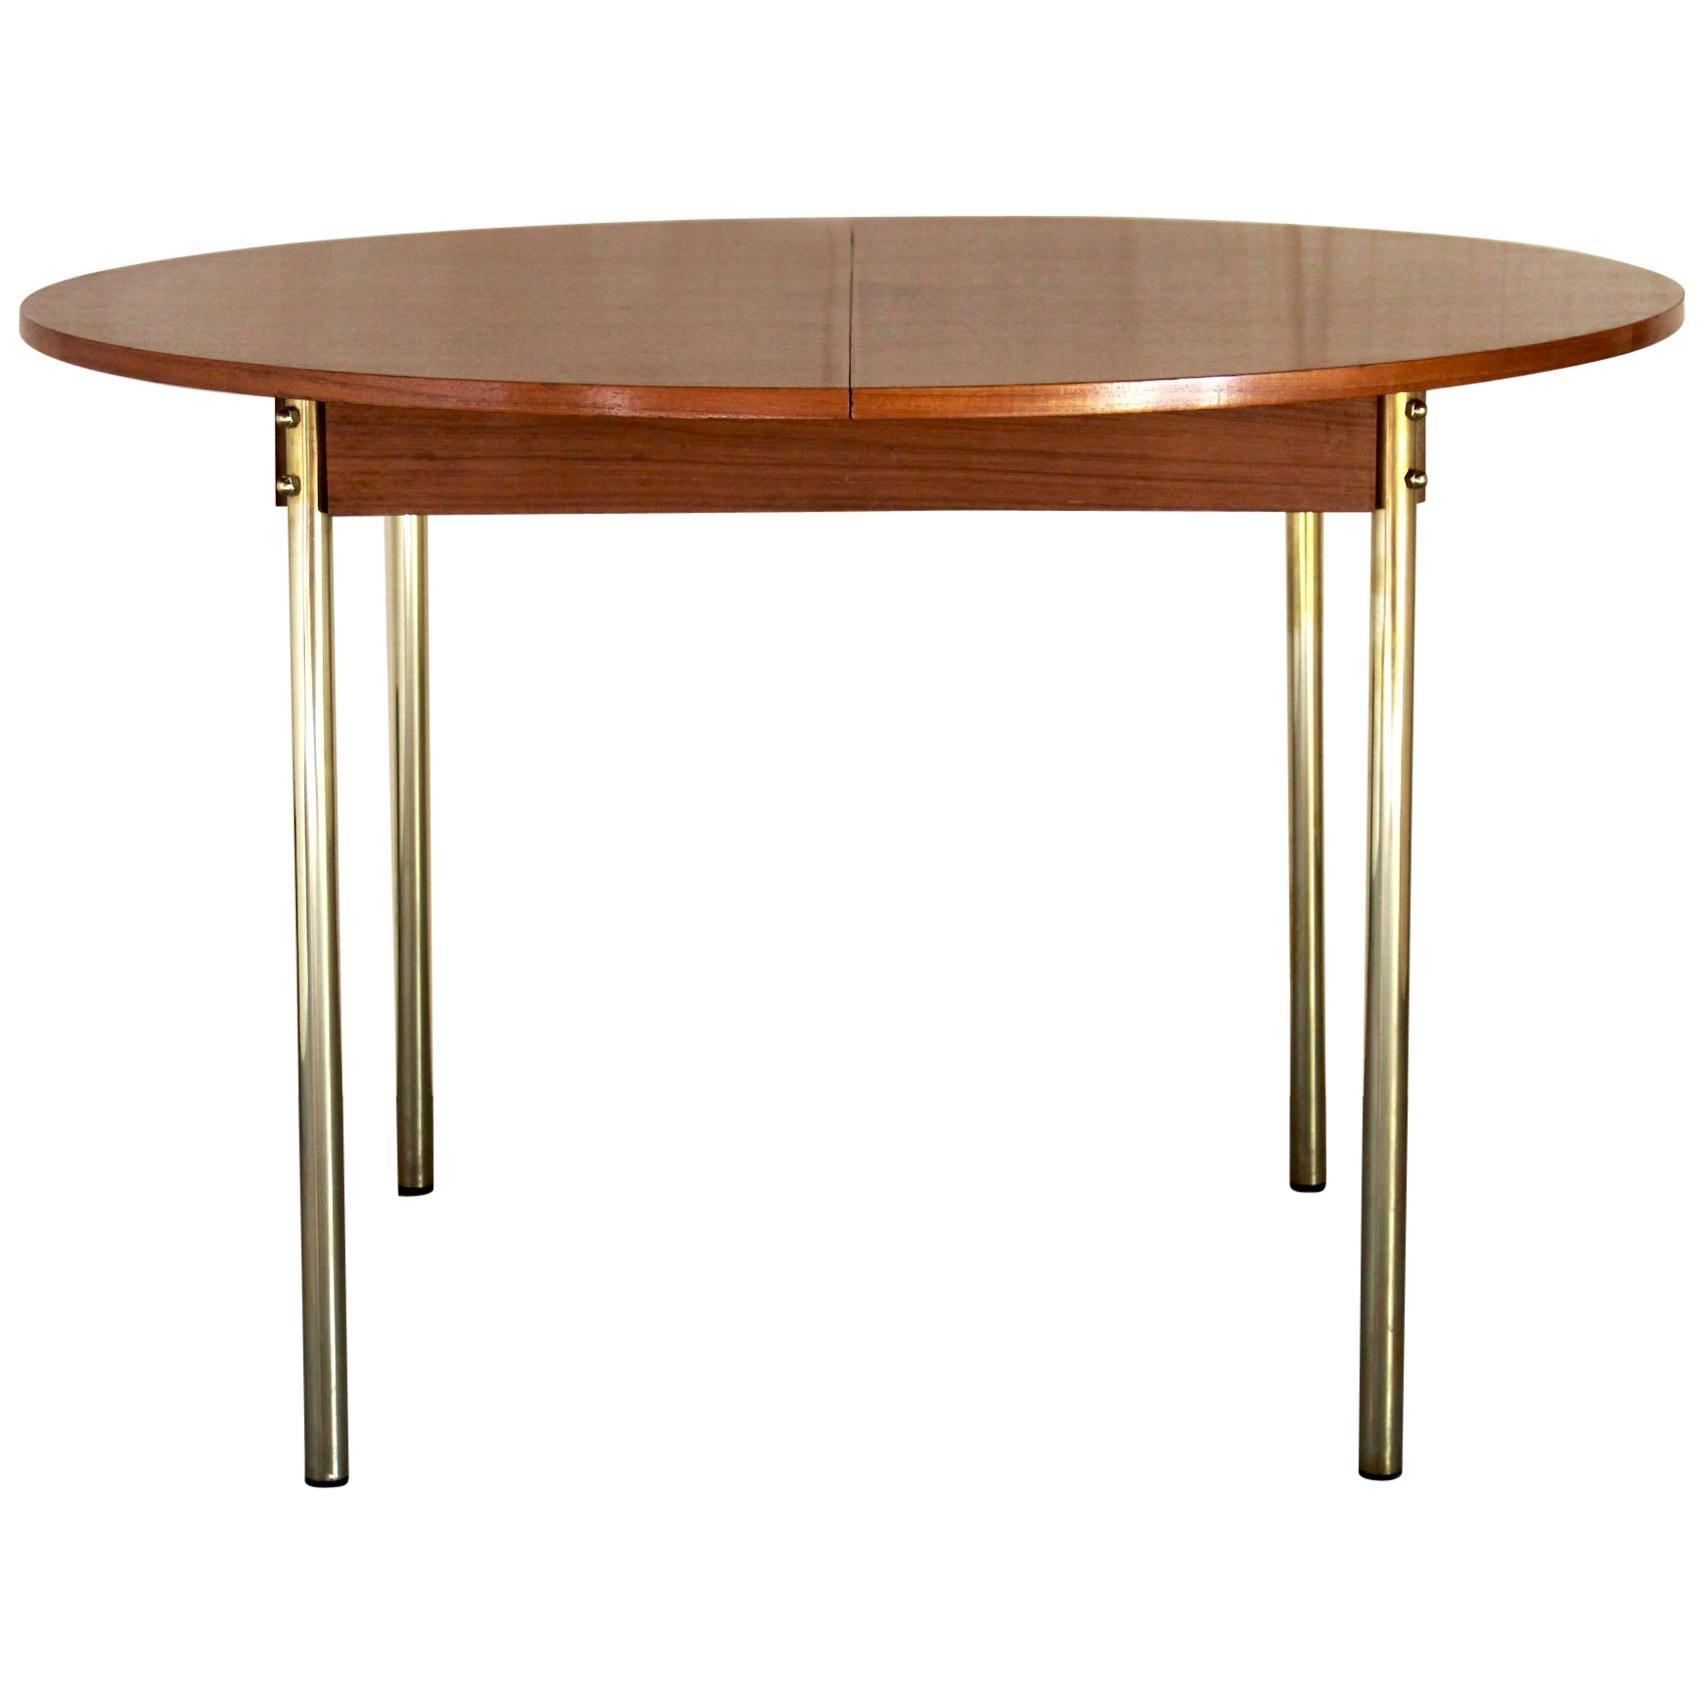 1950s Scandinavian Extendible Dining Table